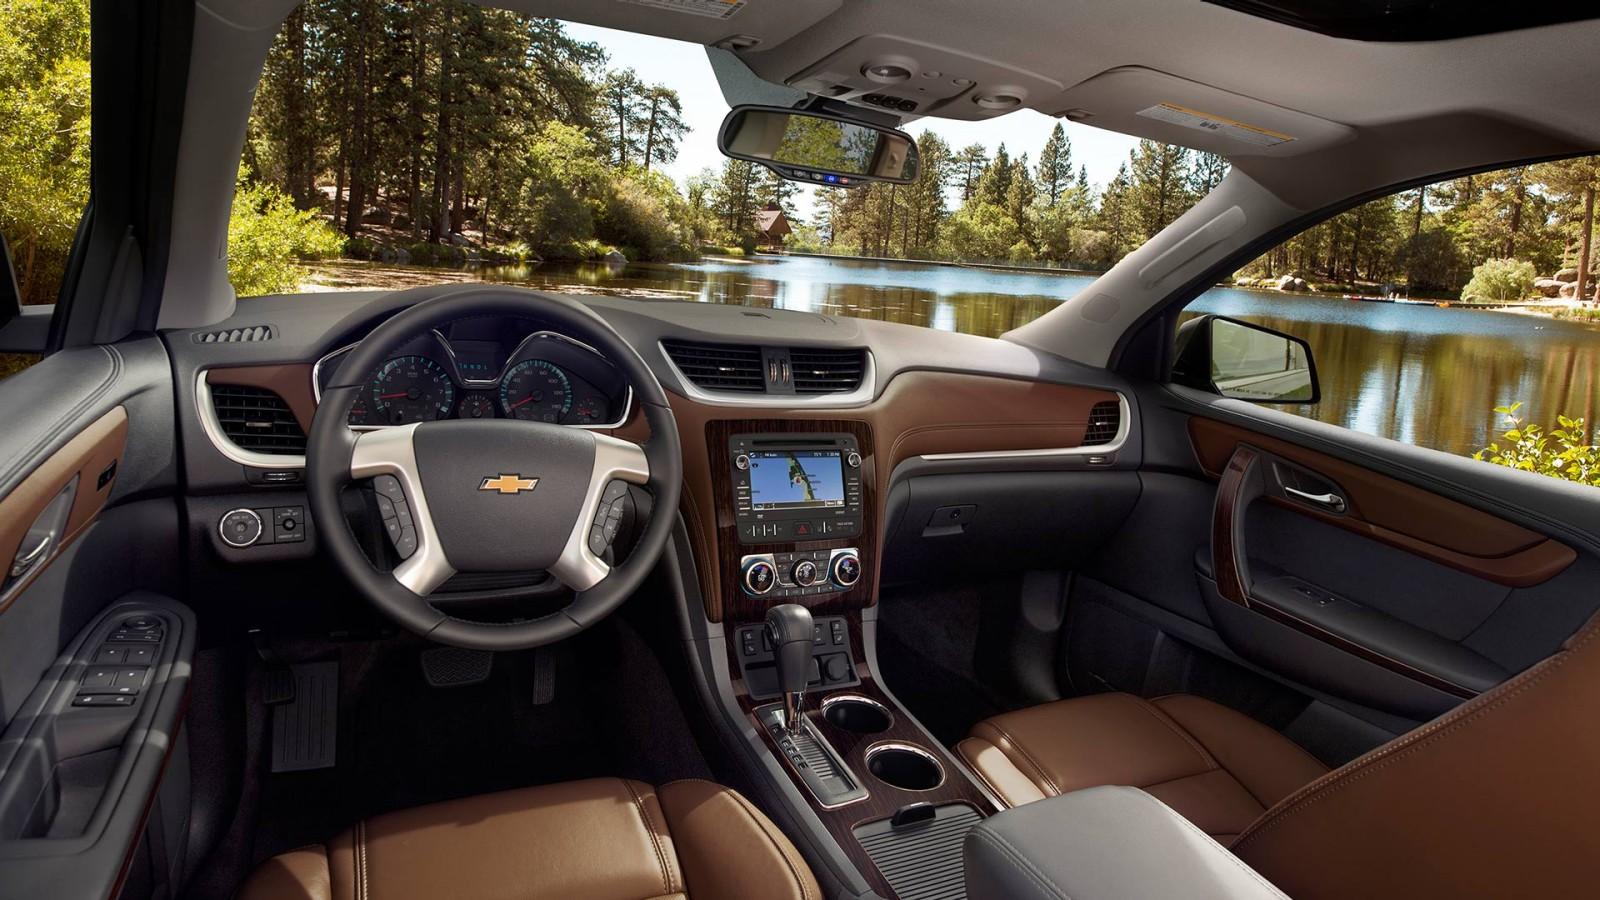 Chevy impala 2016 lease